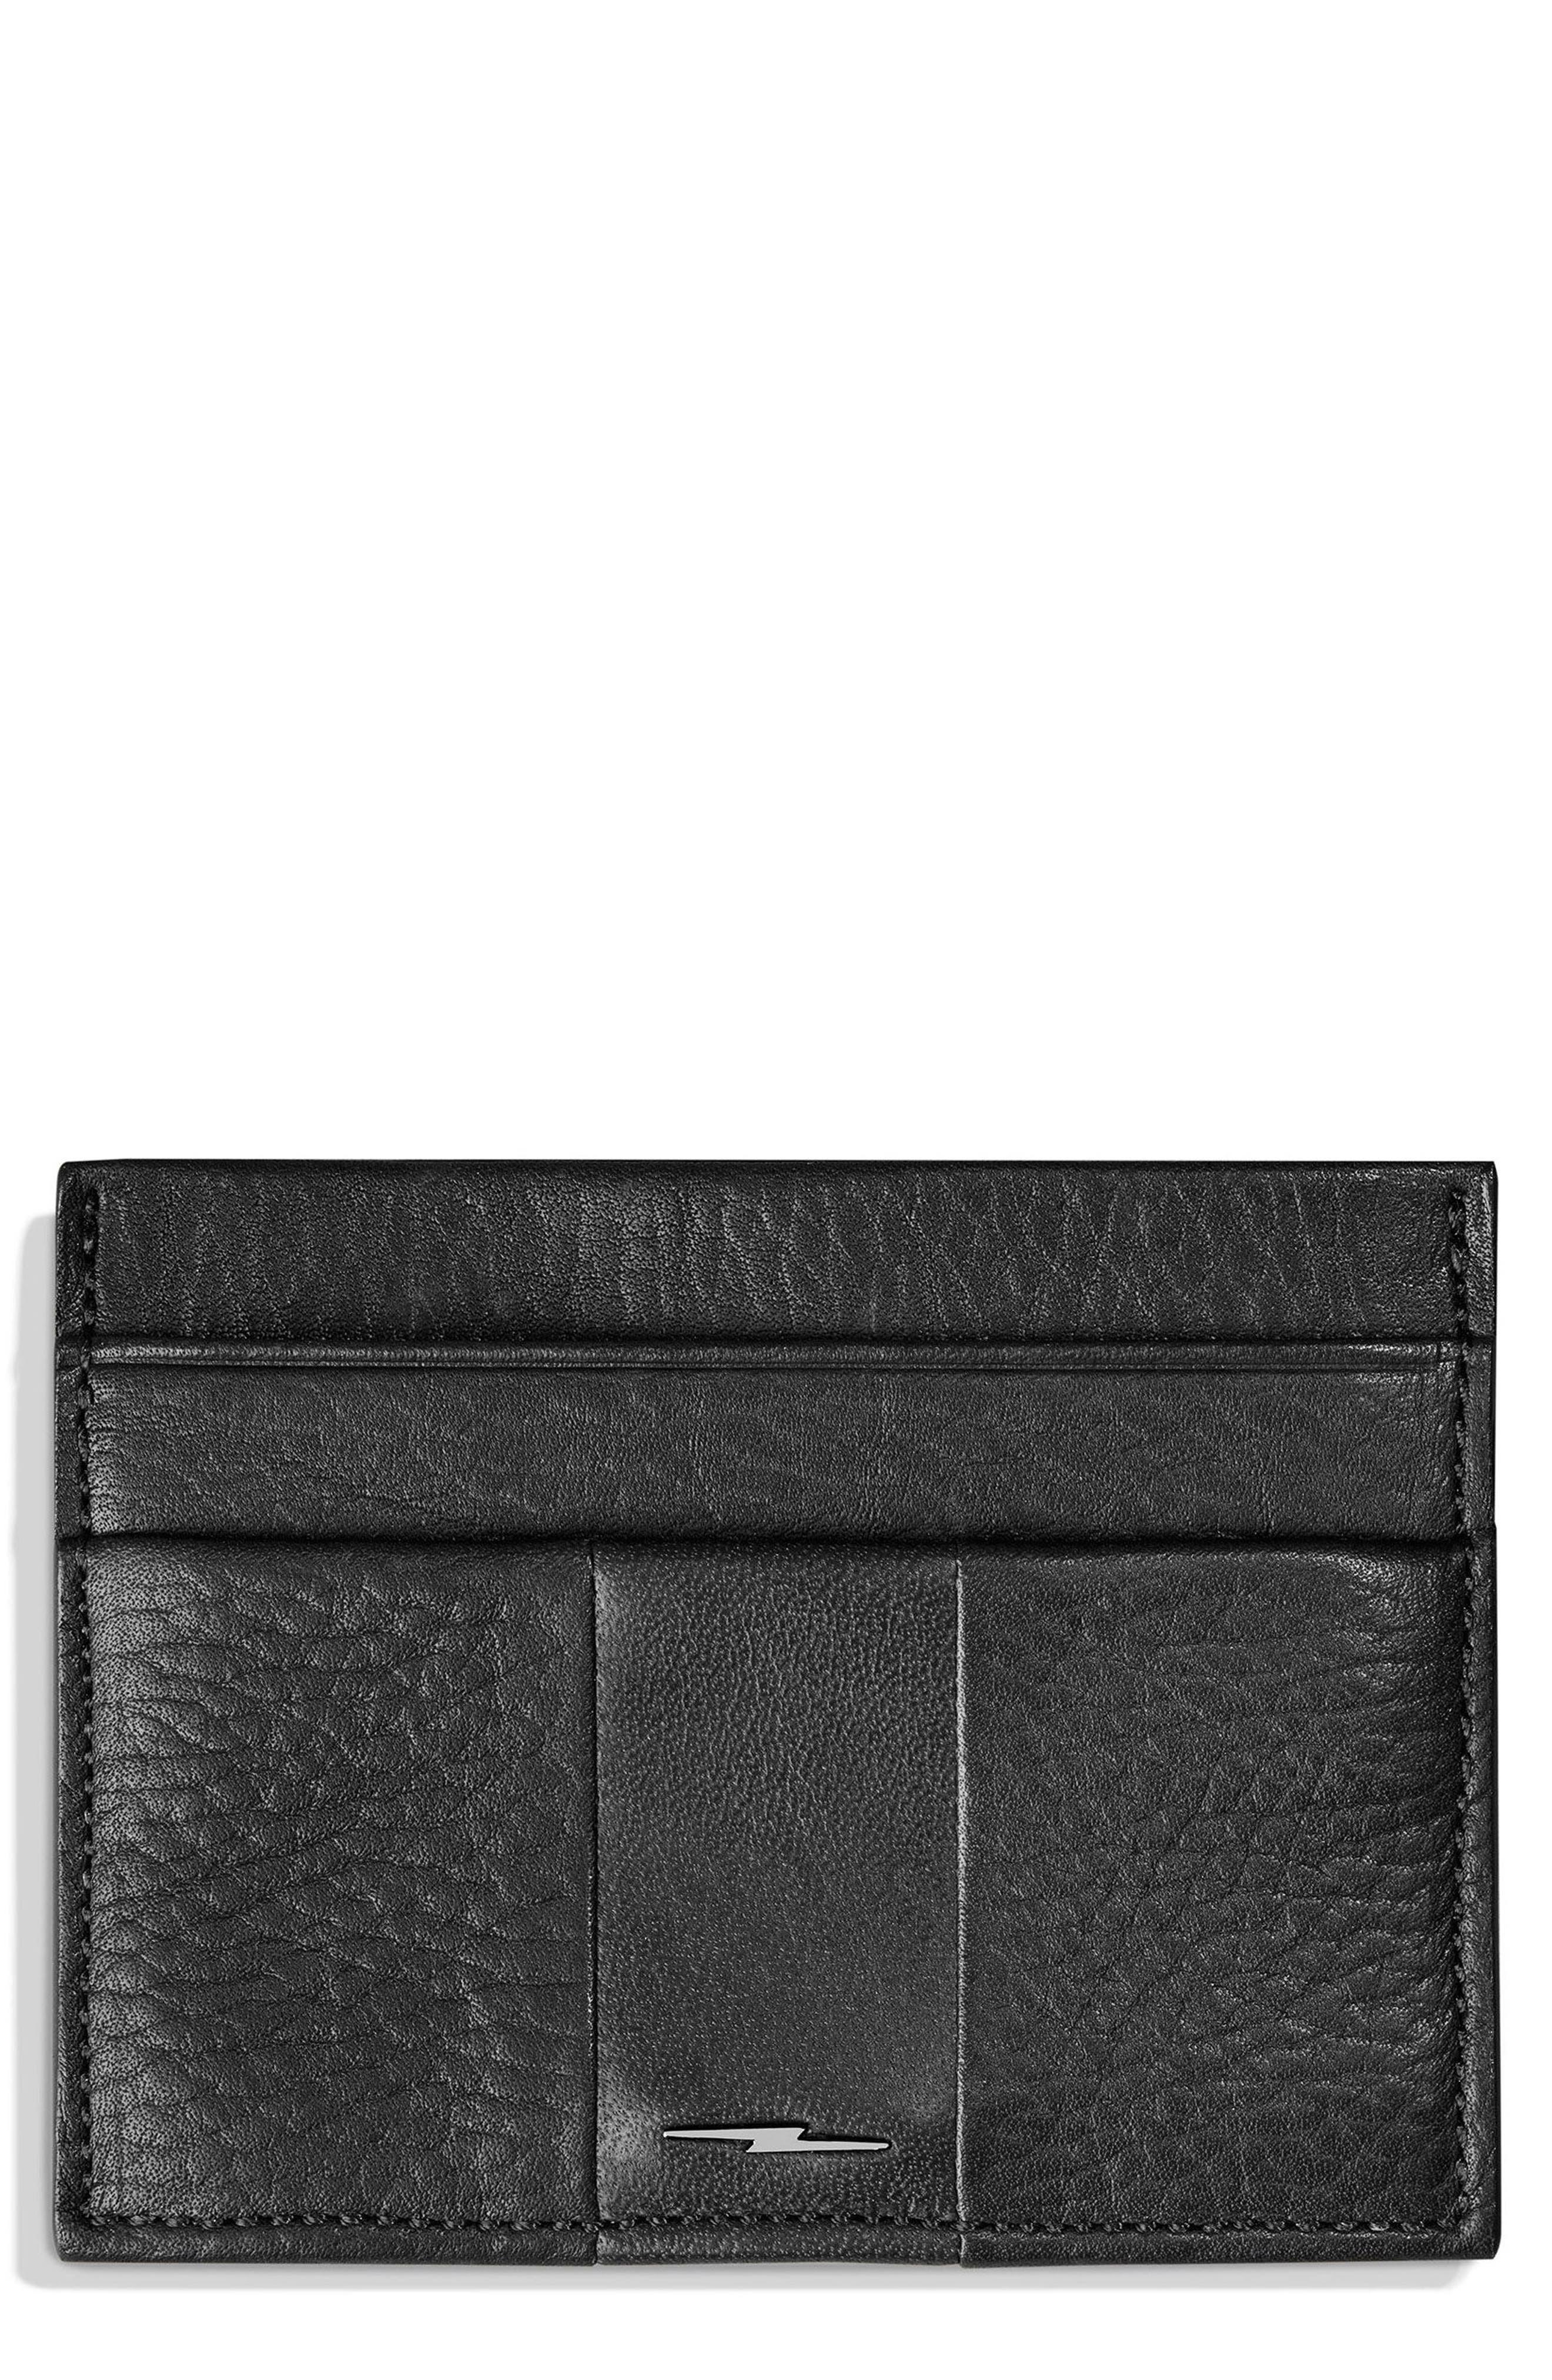 Bolt Leather Card Case,                         Main,                         color, BLACK